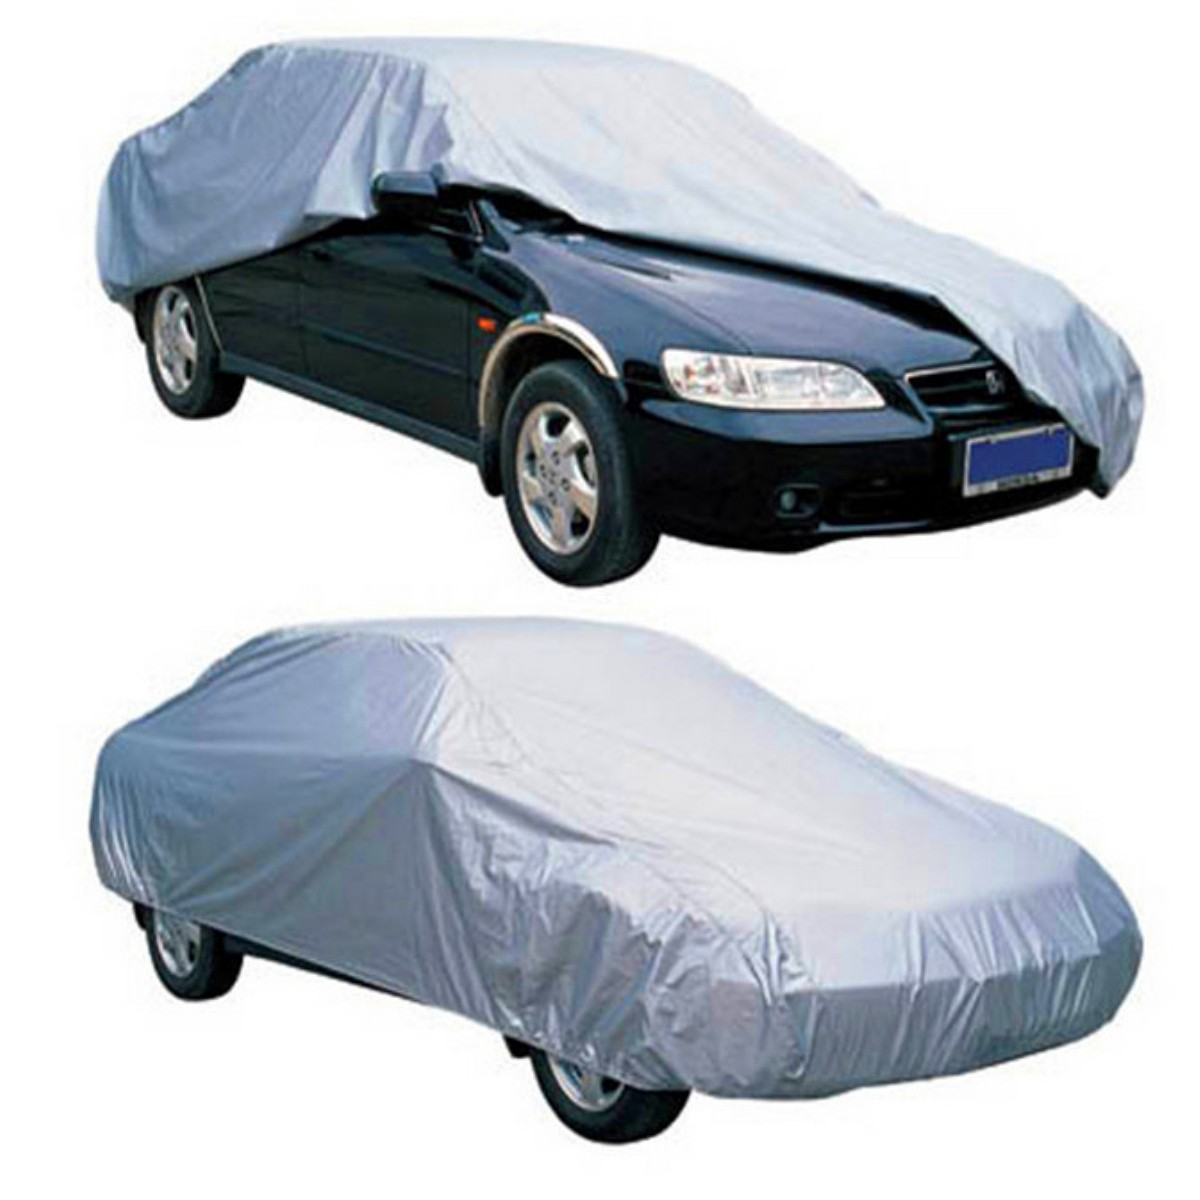 Waterproof Large Size Car Cover Outdoor Sun Uv Snow Dust Rain Resistant Protection Car Sun Shield